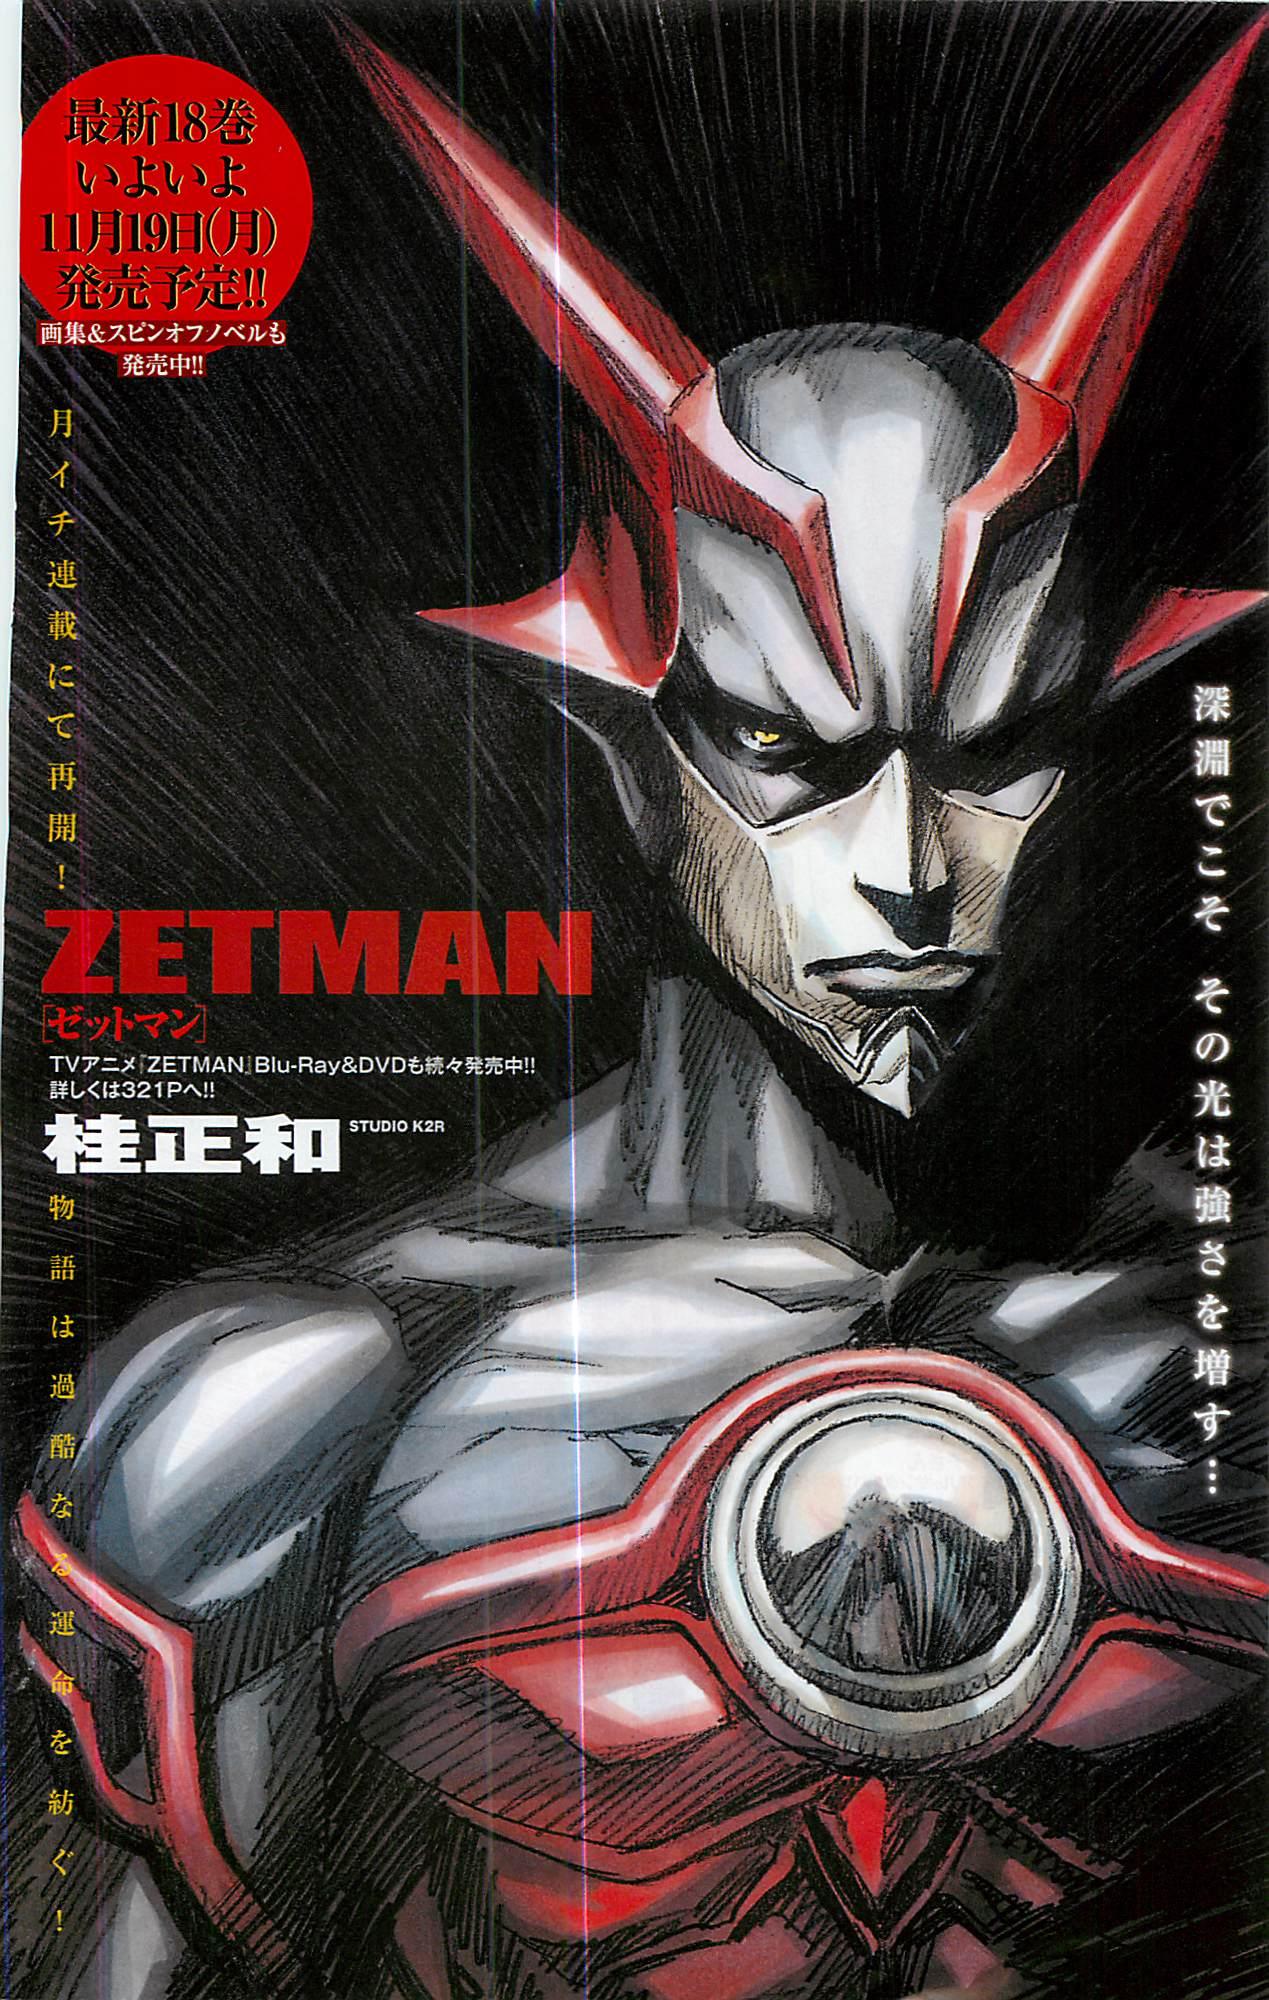 Amazing Zetman Pictures & Backgrounds